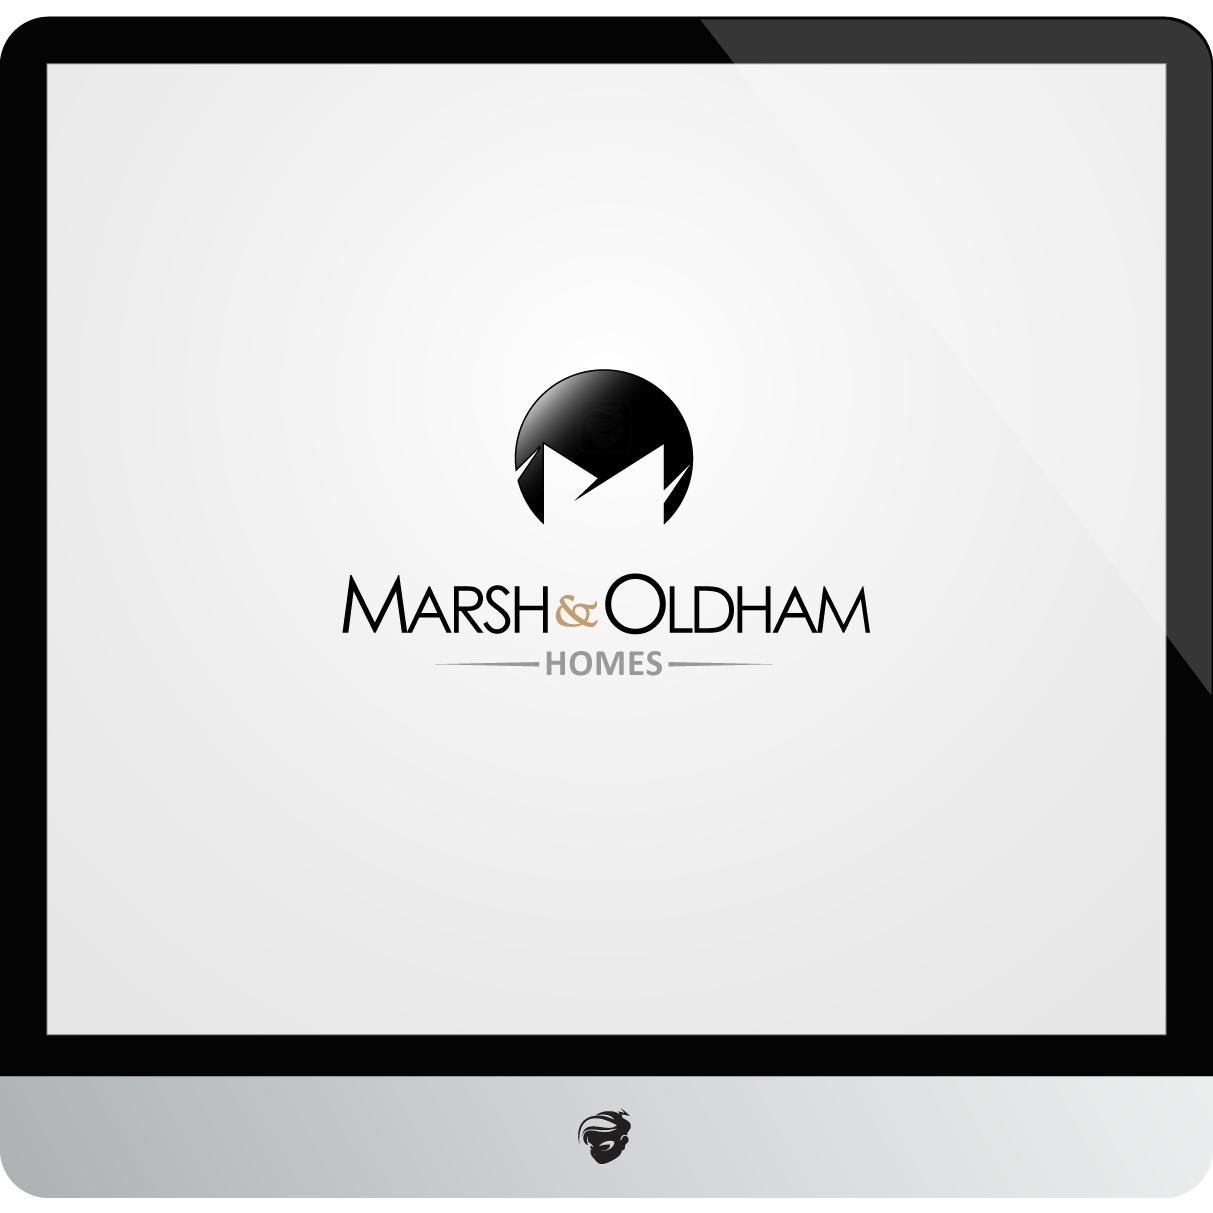 Logo Design by zesthar - Entry No. 111 in the Logo Design Contest Artistic Logo Design for Marsh & Oldham Homes.